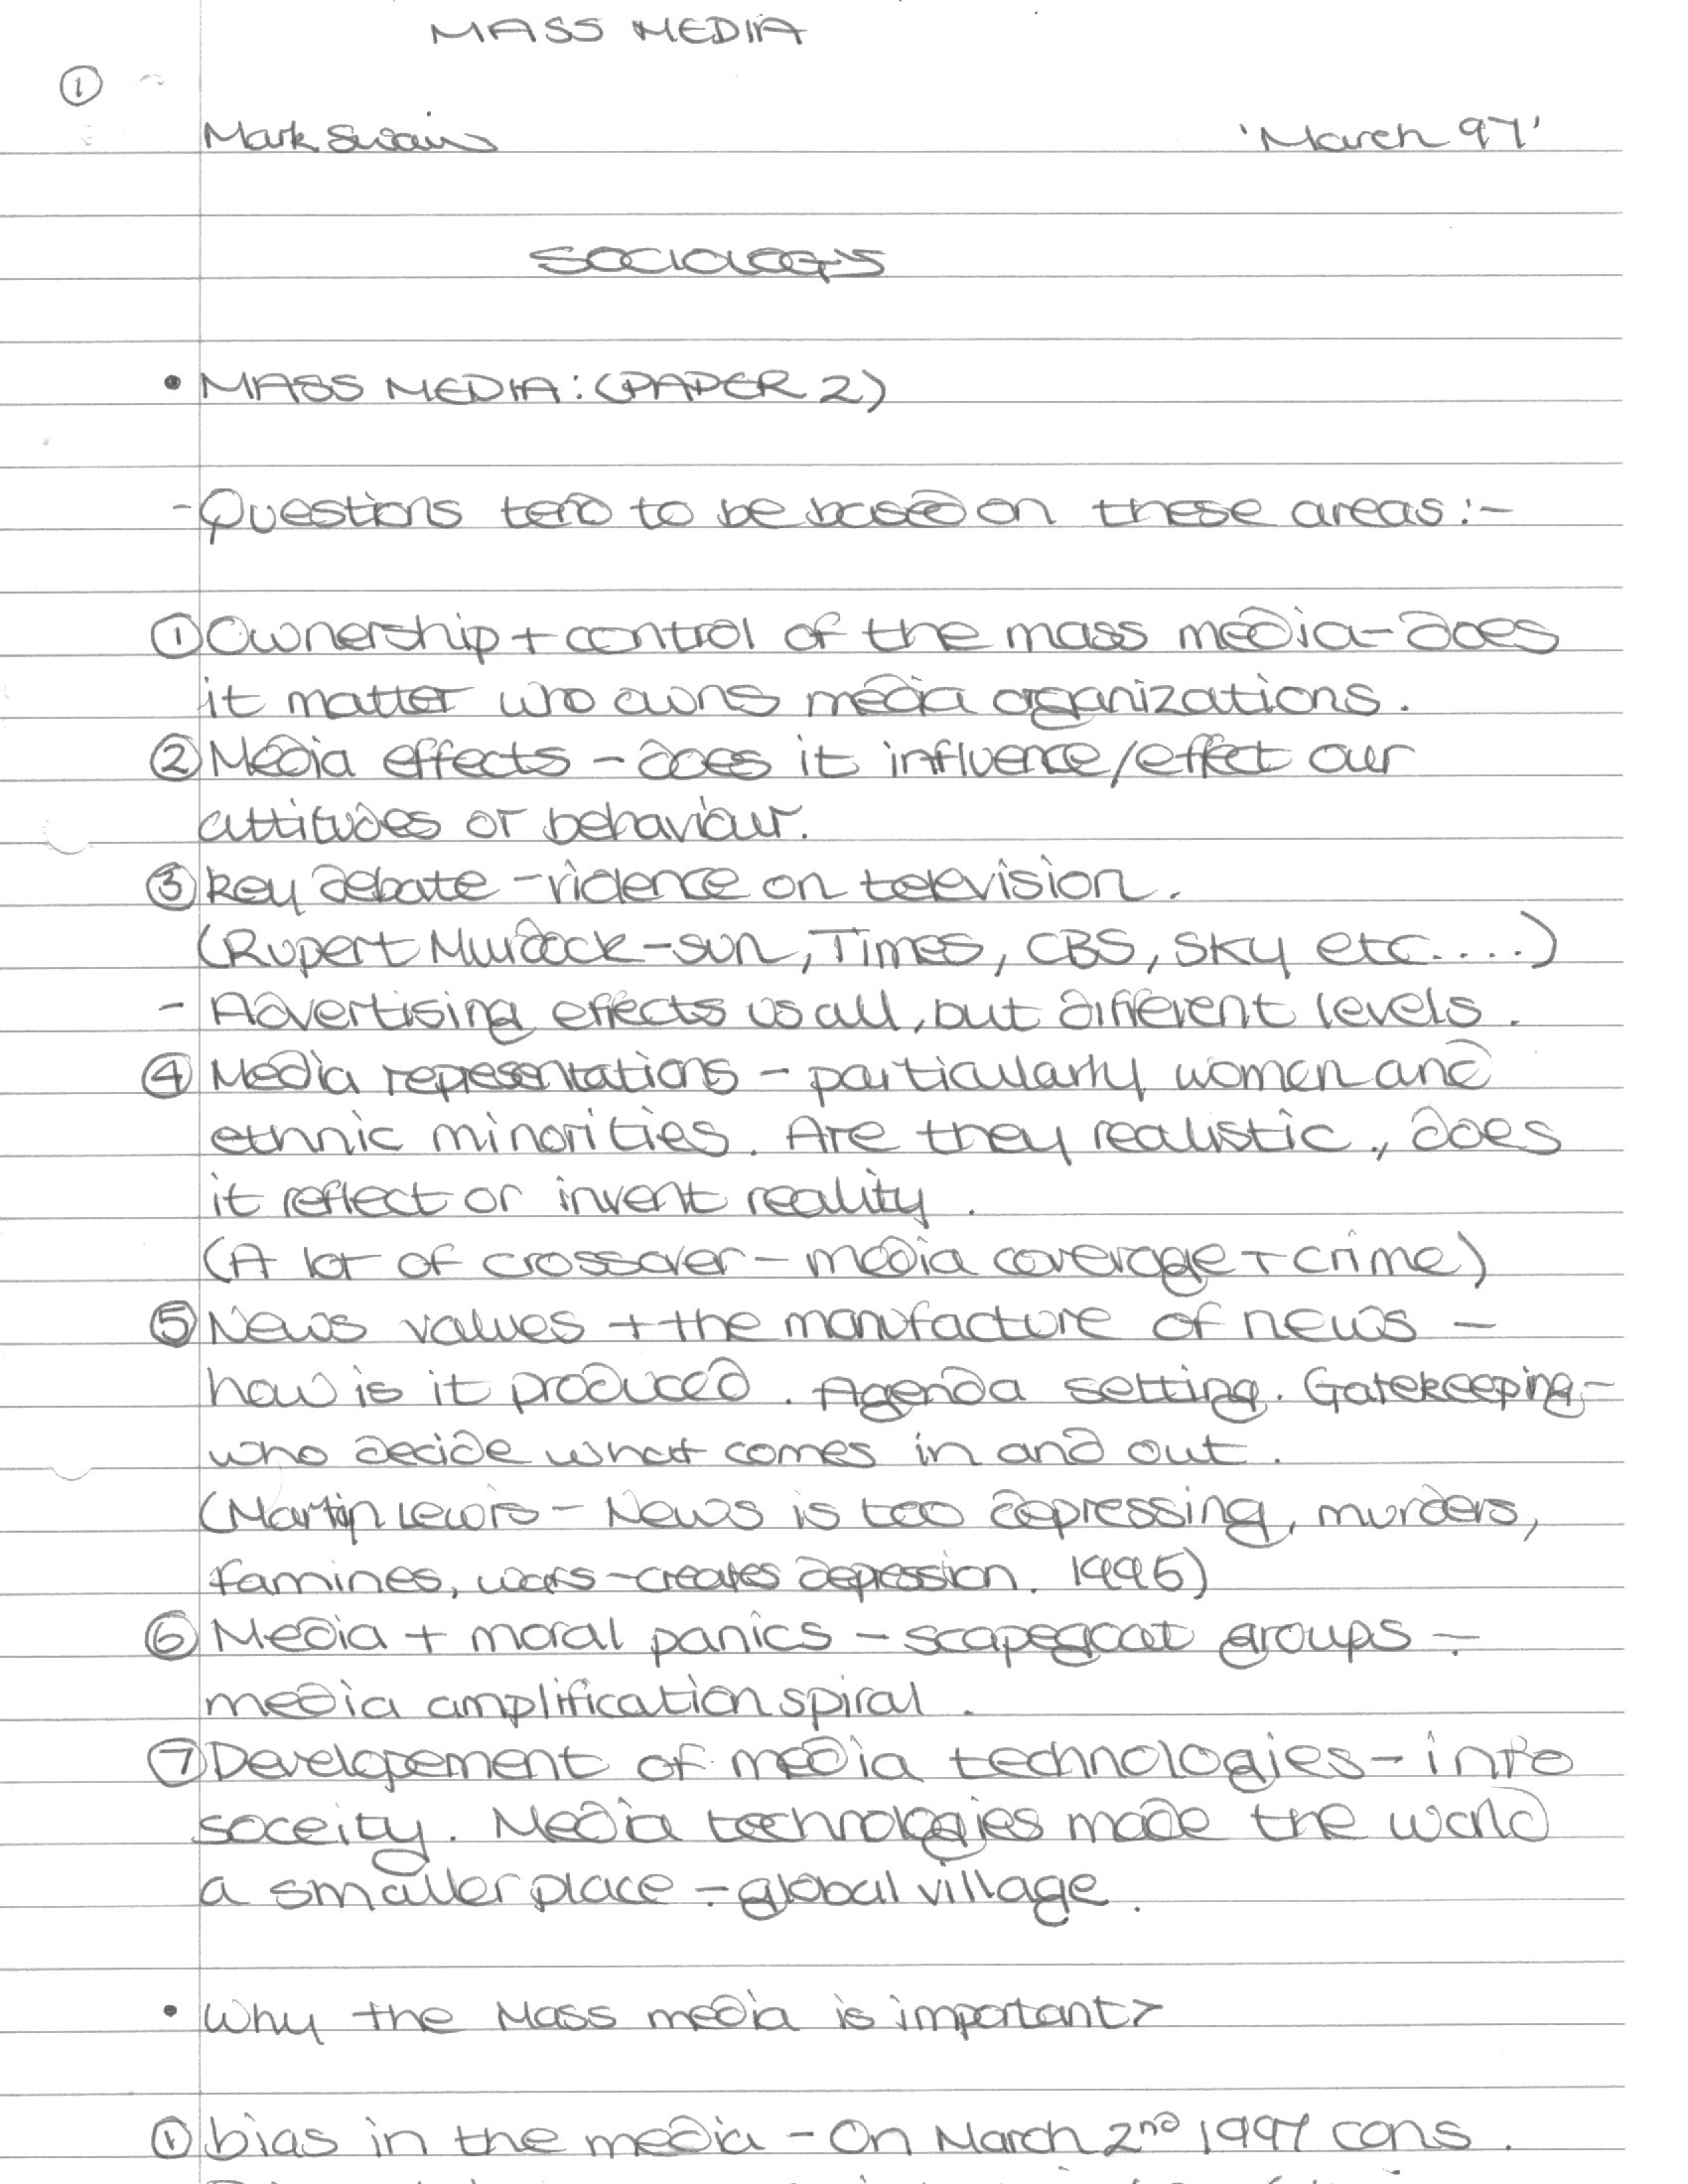 sociology gcse mass media notes Has anyone completed their a-level mass media notes for sociology thanks.